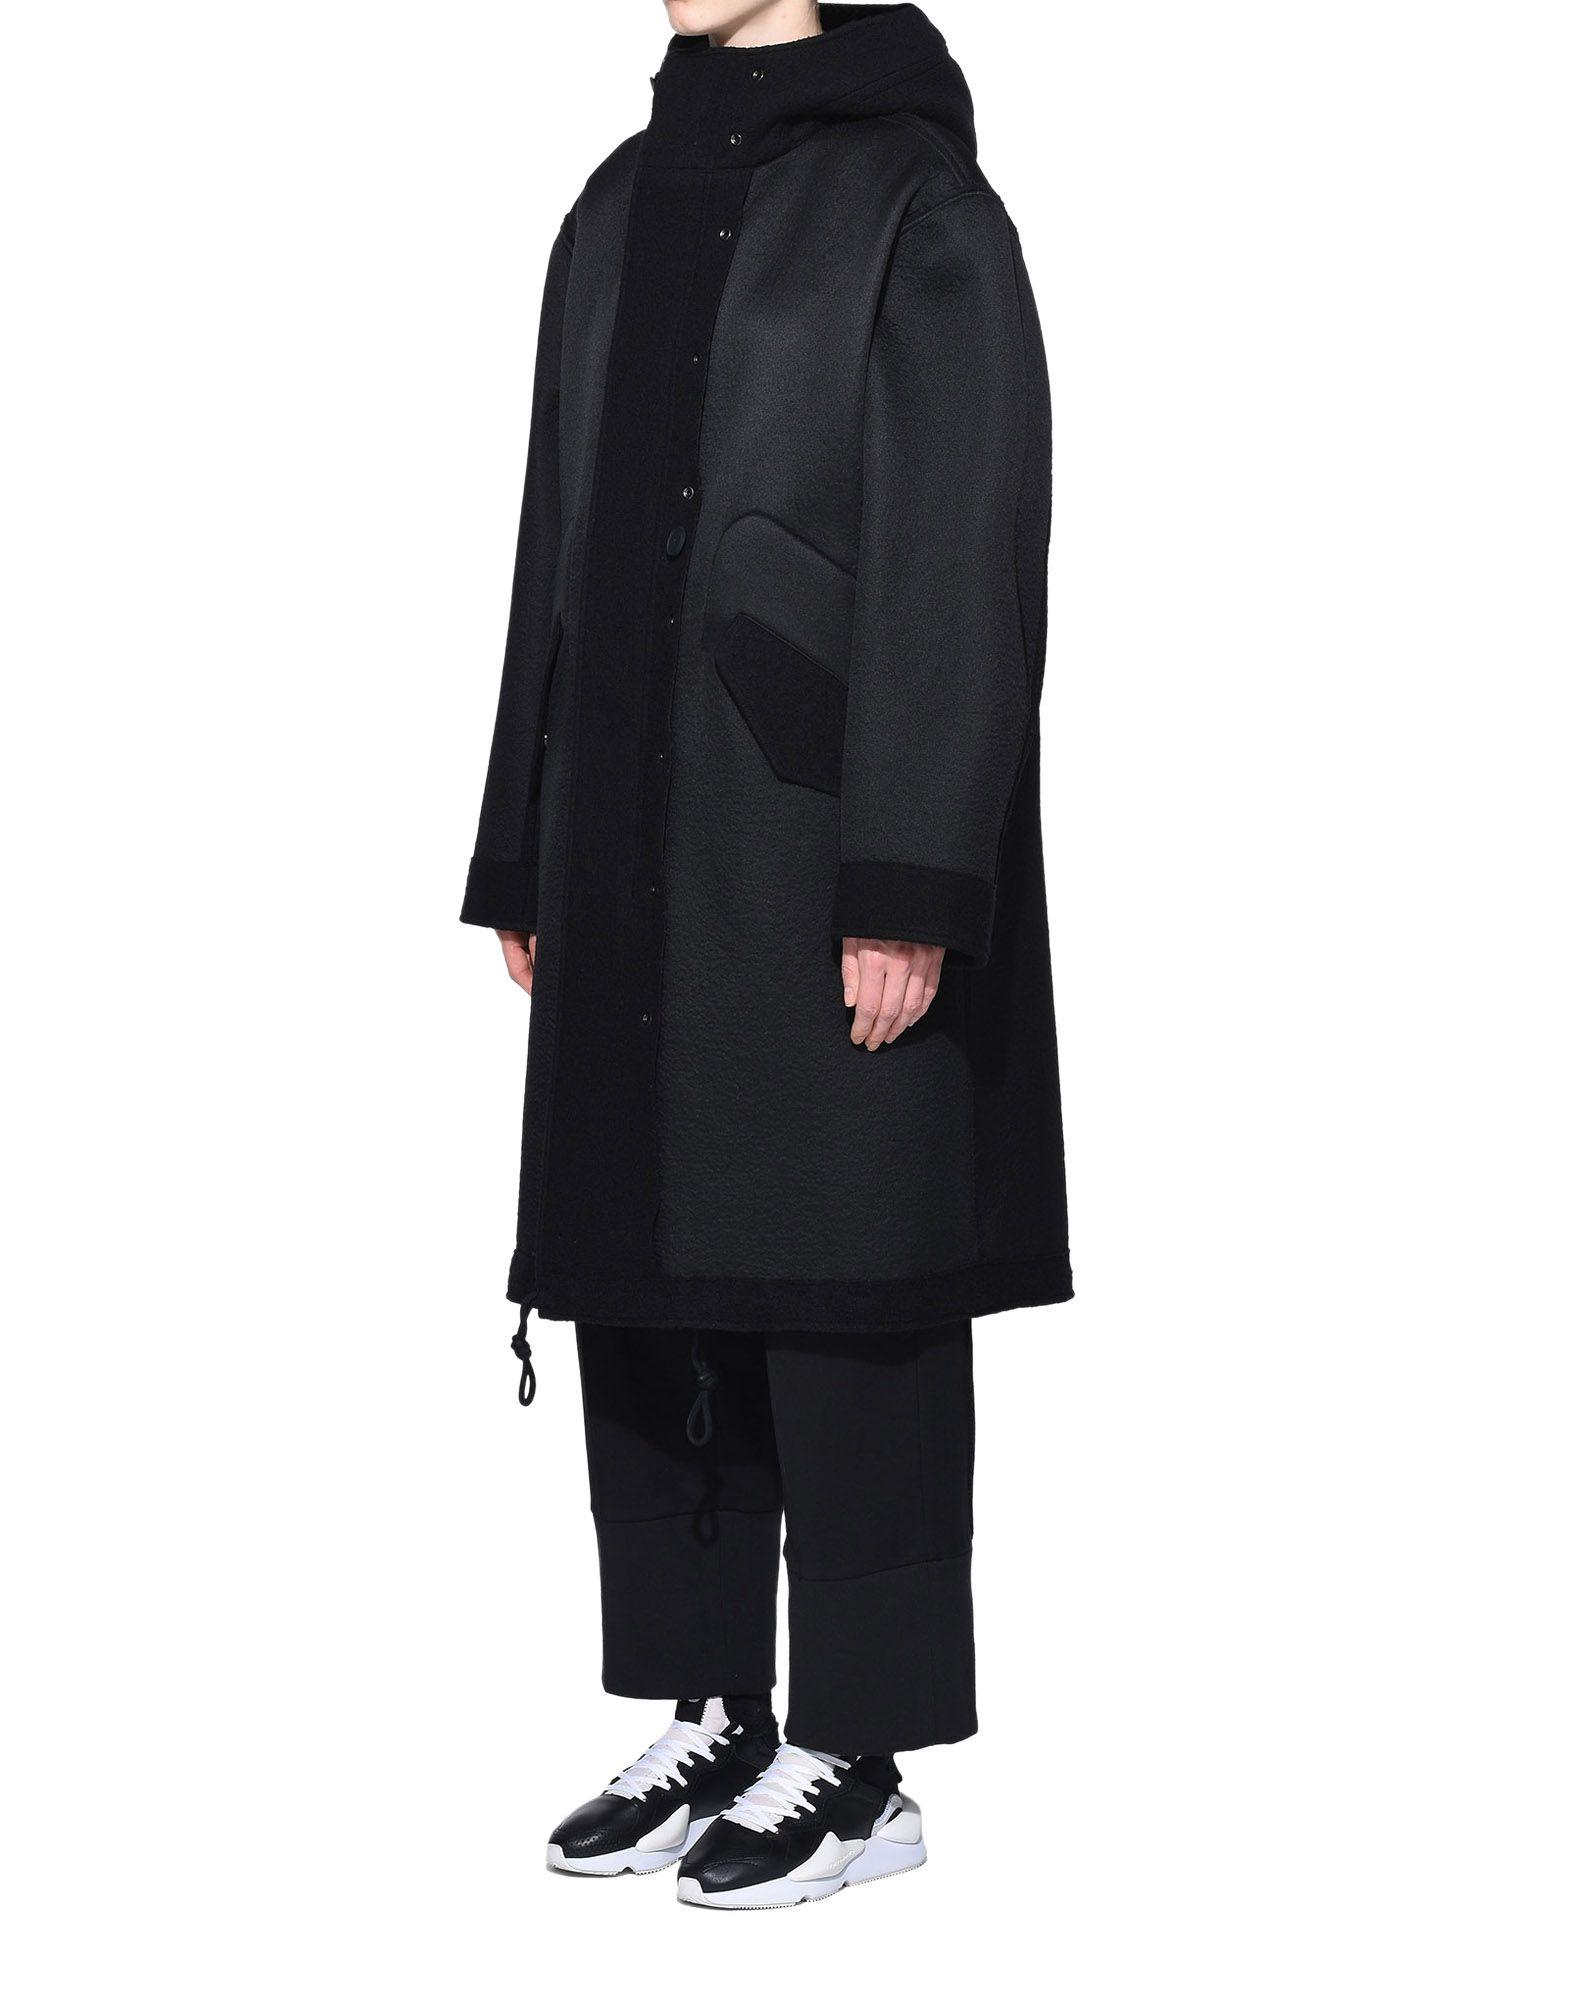 Y-3 Y-3 Reversible Wool Parka Coat Woman e